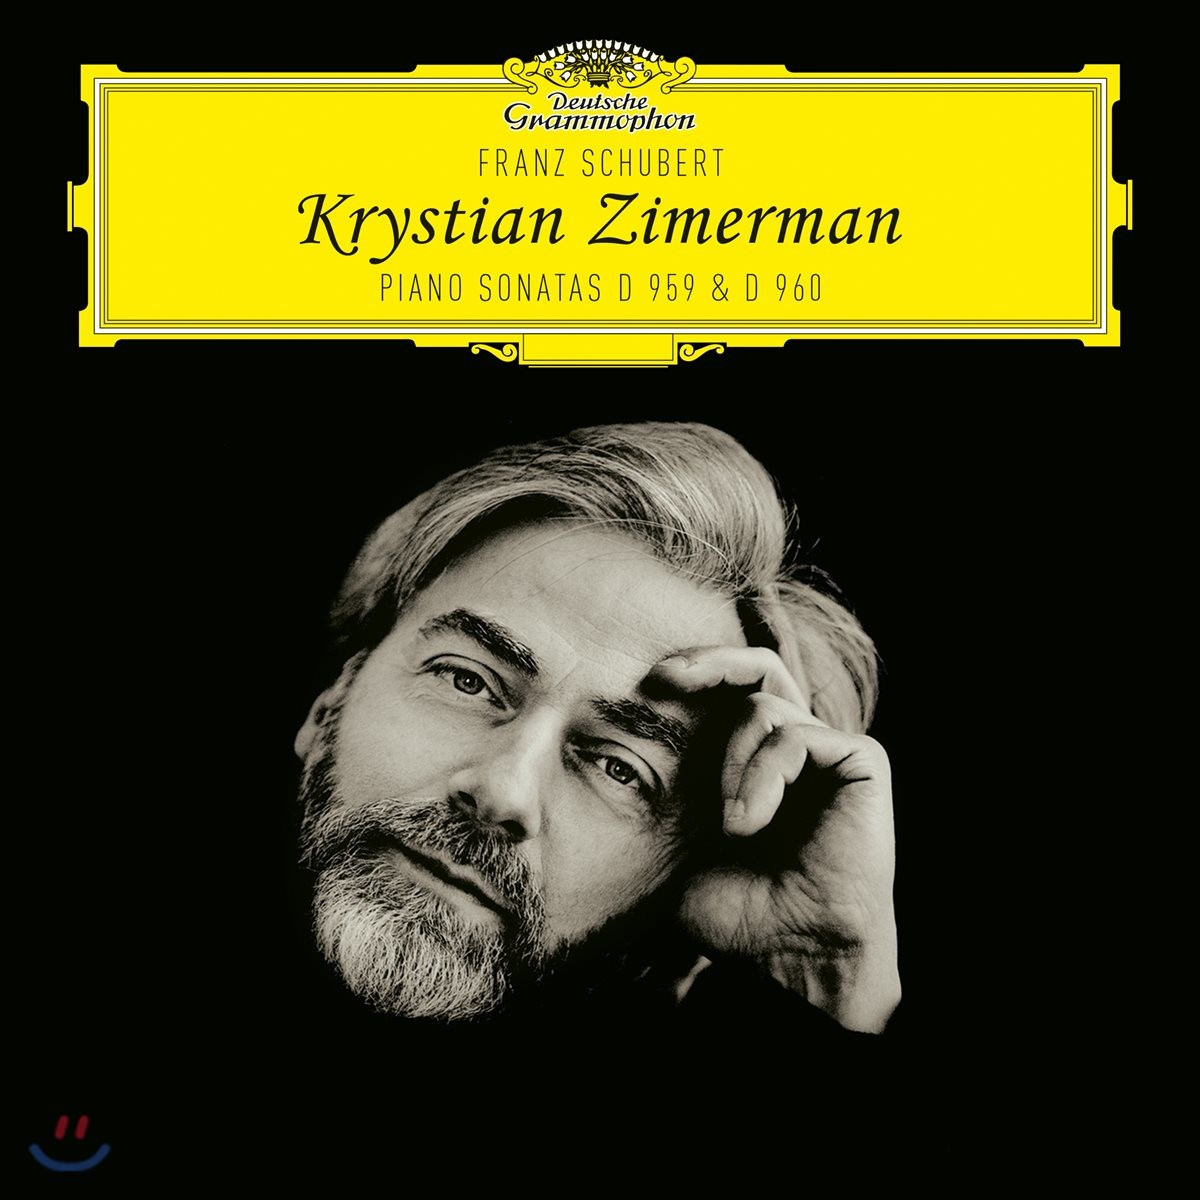 Krystian Zimerman 크리스티안 지메르만 - 슈베르트: 피아노 소나타 20번, 21번 (Schubert: Piano Sonatas D.959 & D.960)